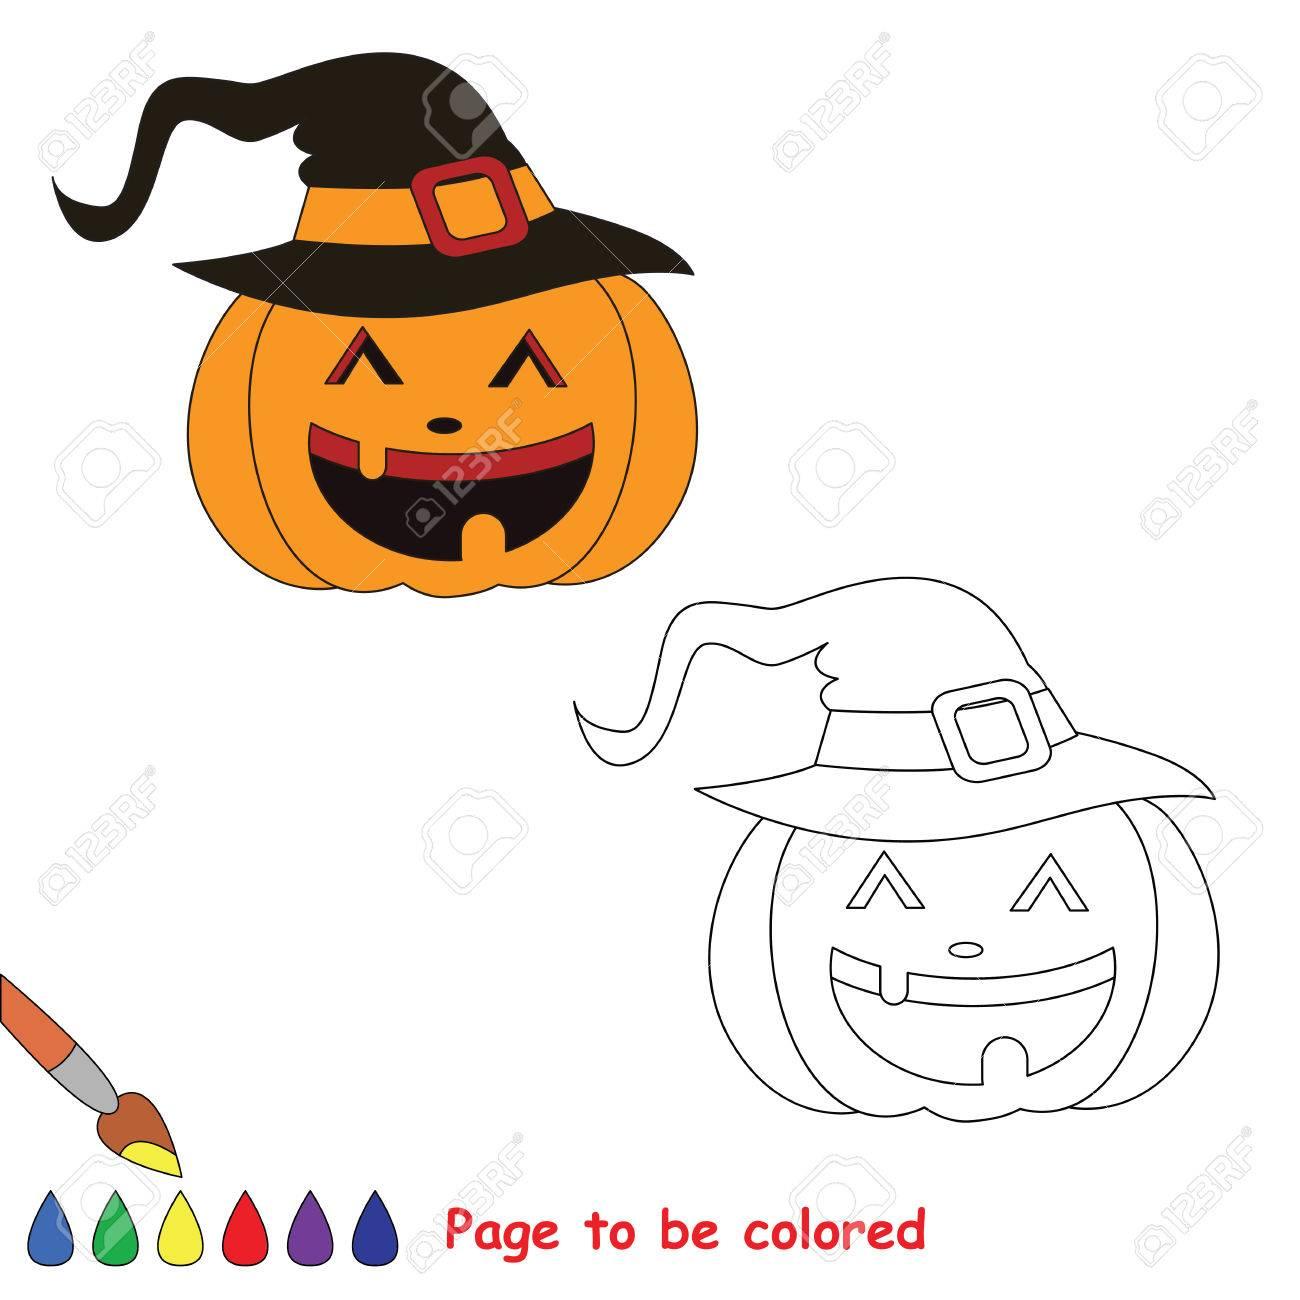 Vector De Dibujos Animados De Calabaza De Halloween Para Colorear ...